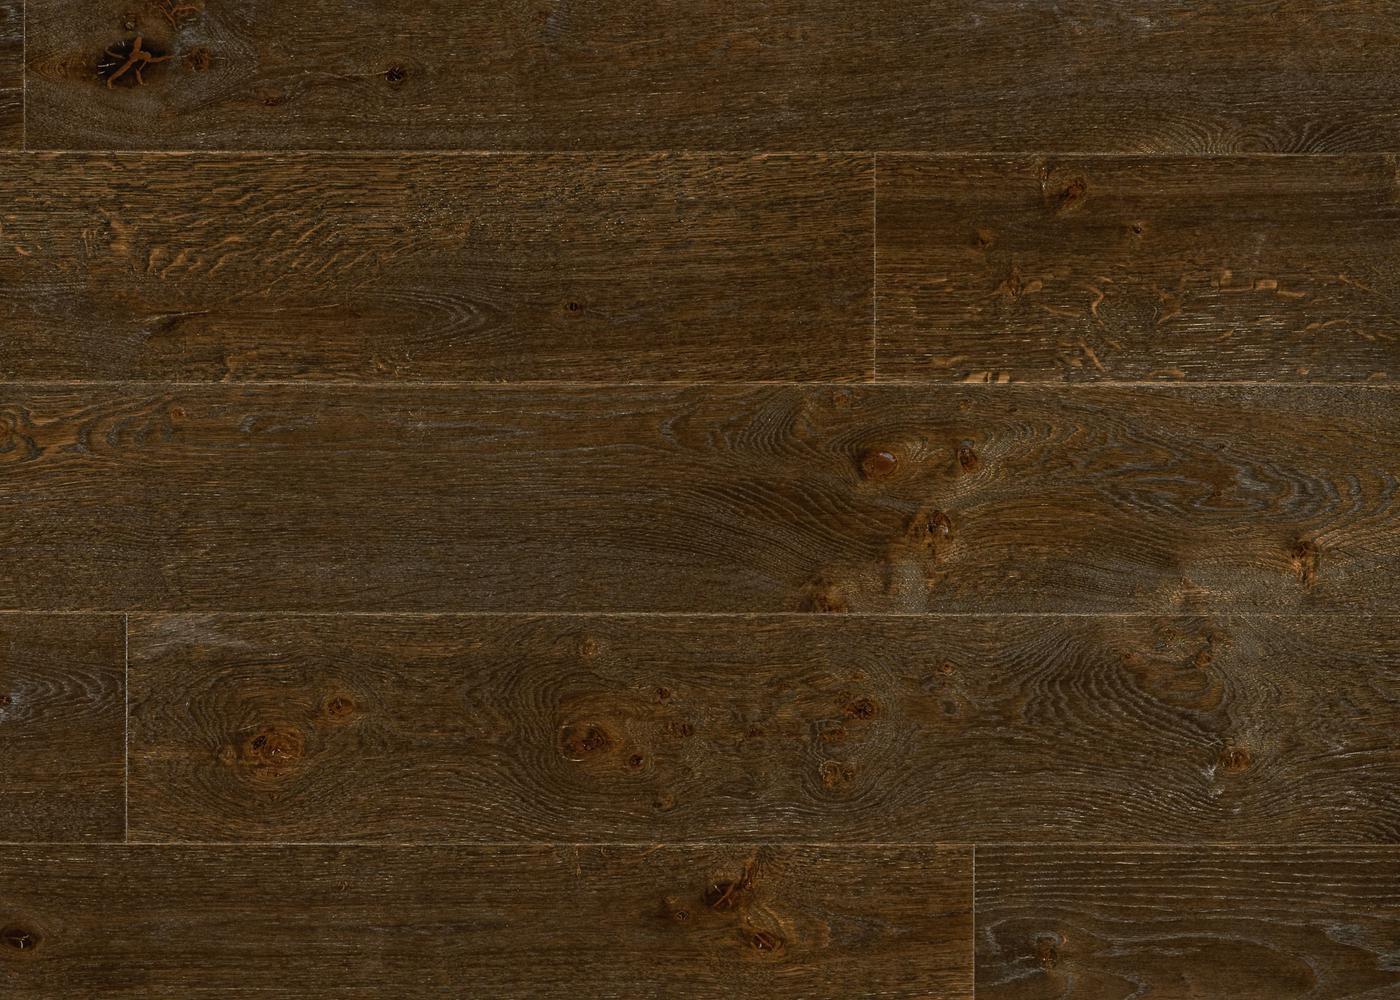 Parquet chêne contrecollé REUILLY brossé huile UV Matière support HDF 10x122x1190